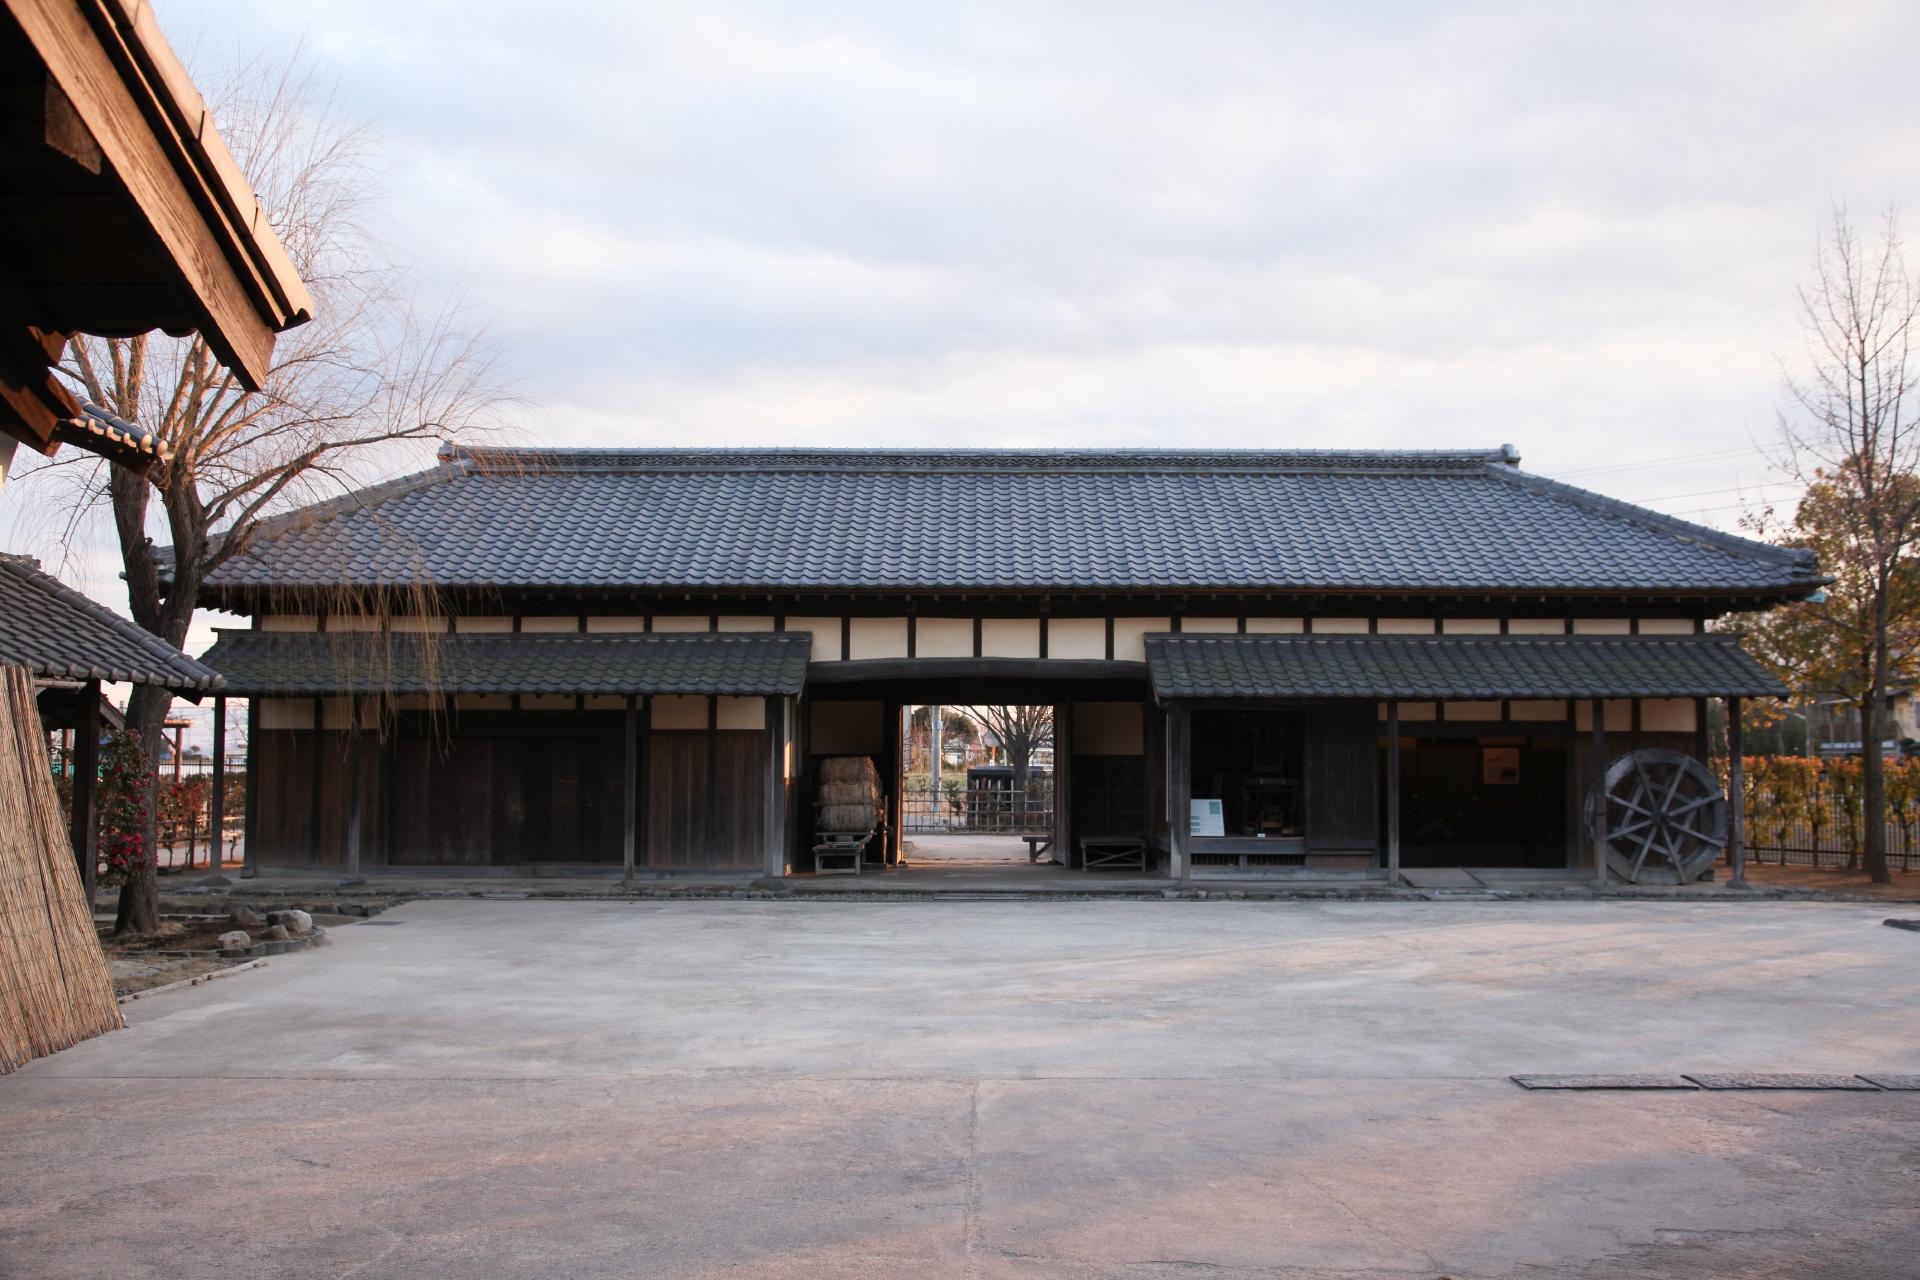 富士見市の古民家の長屋門 埼玉の風景